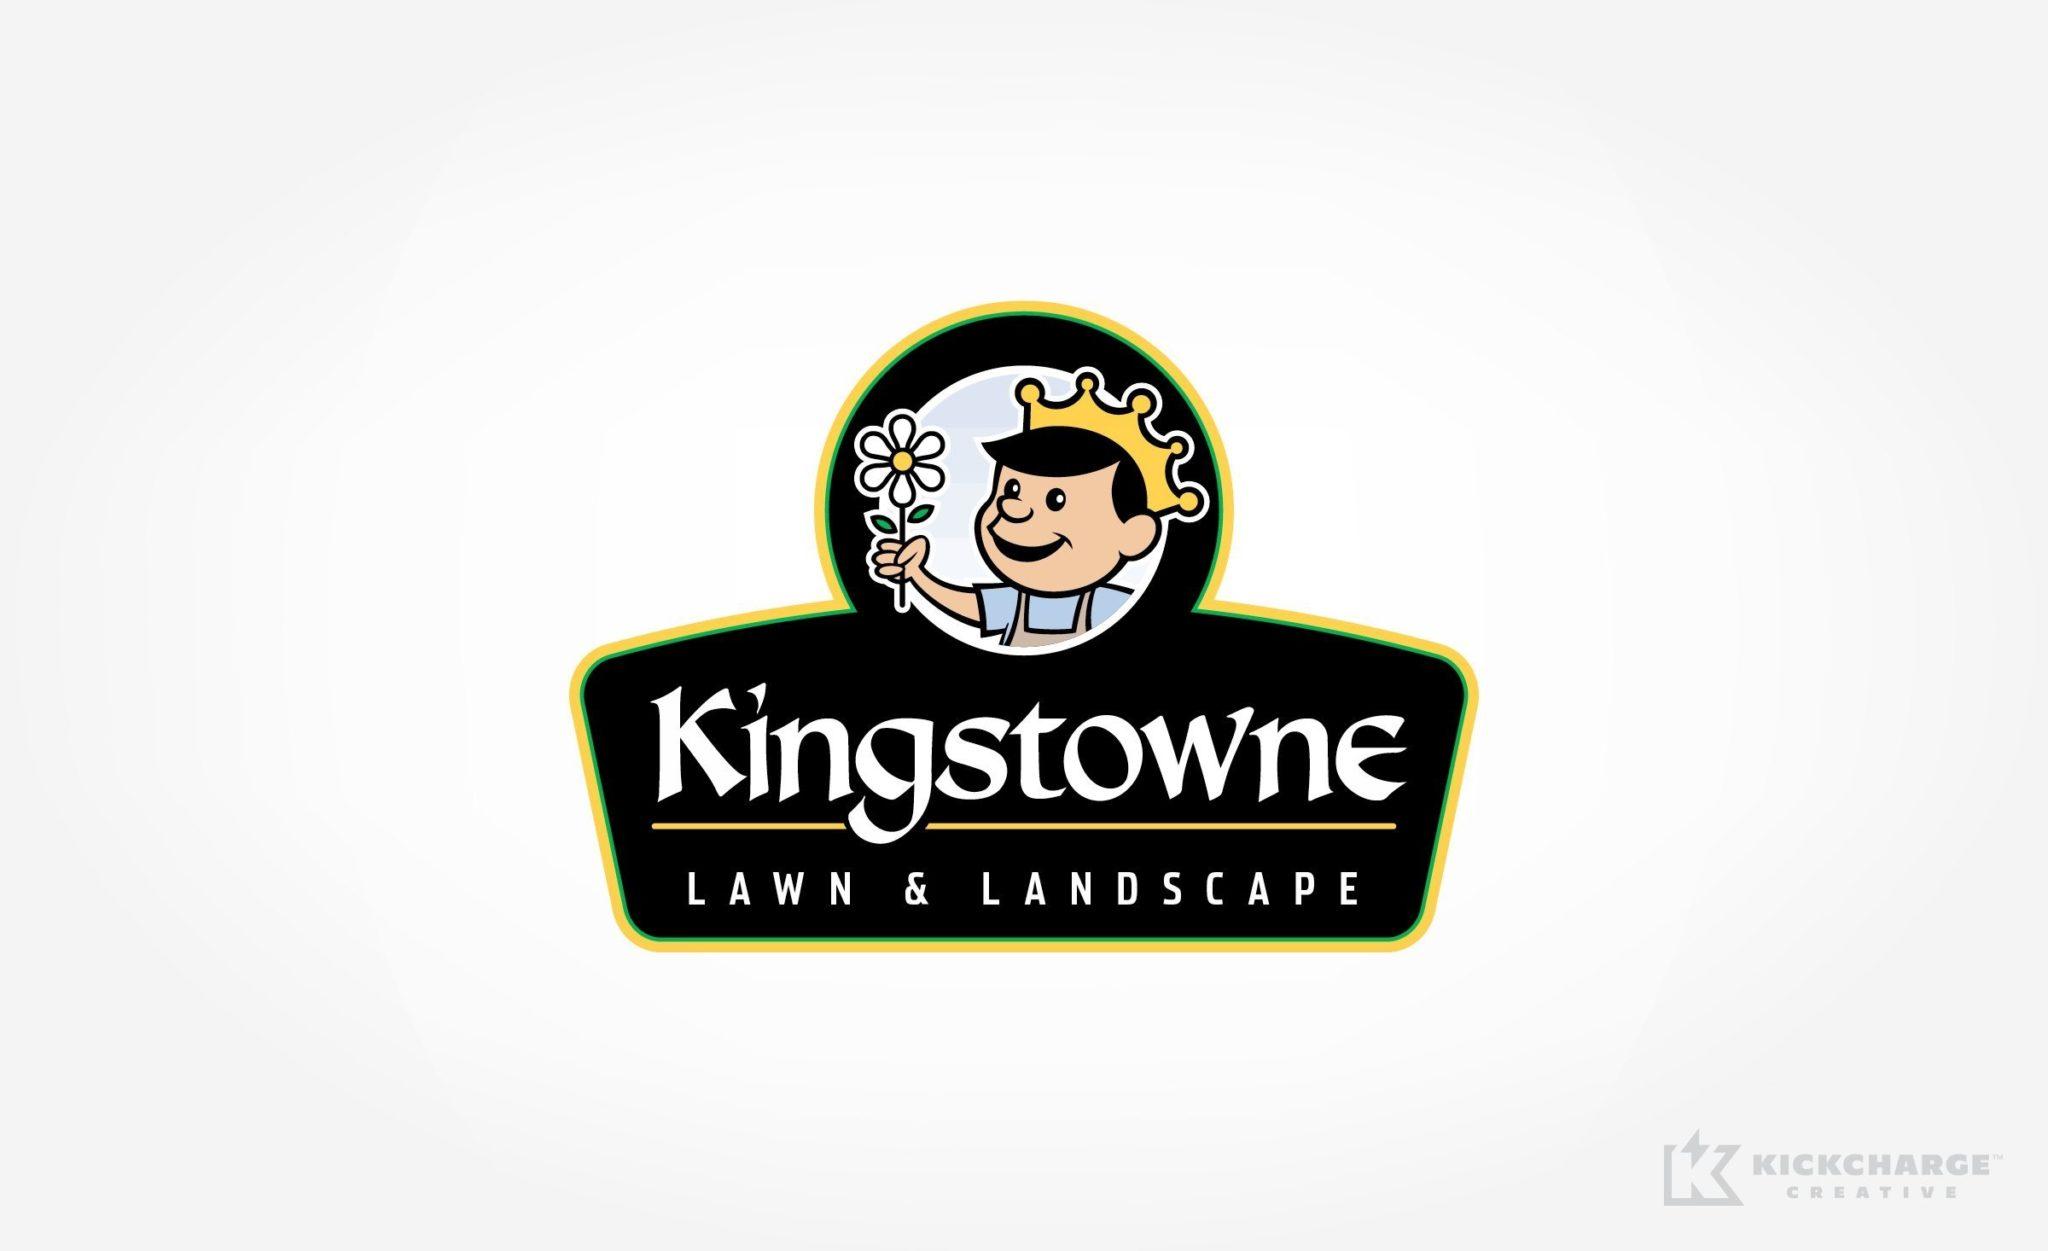 Kingstowne Lawn & Landscaping